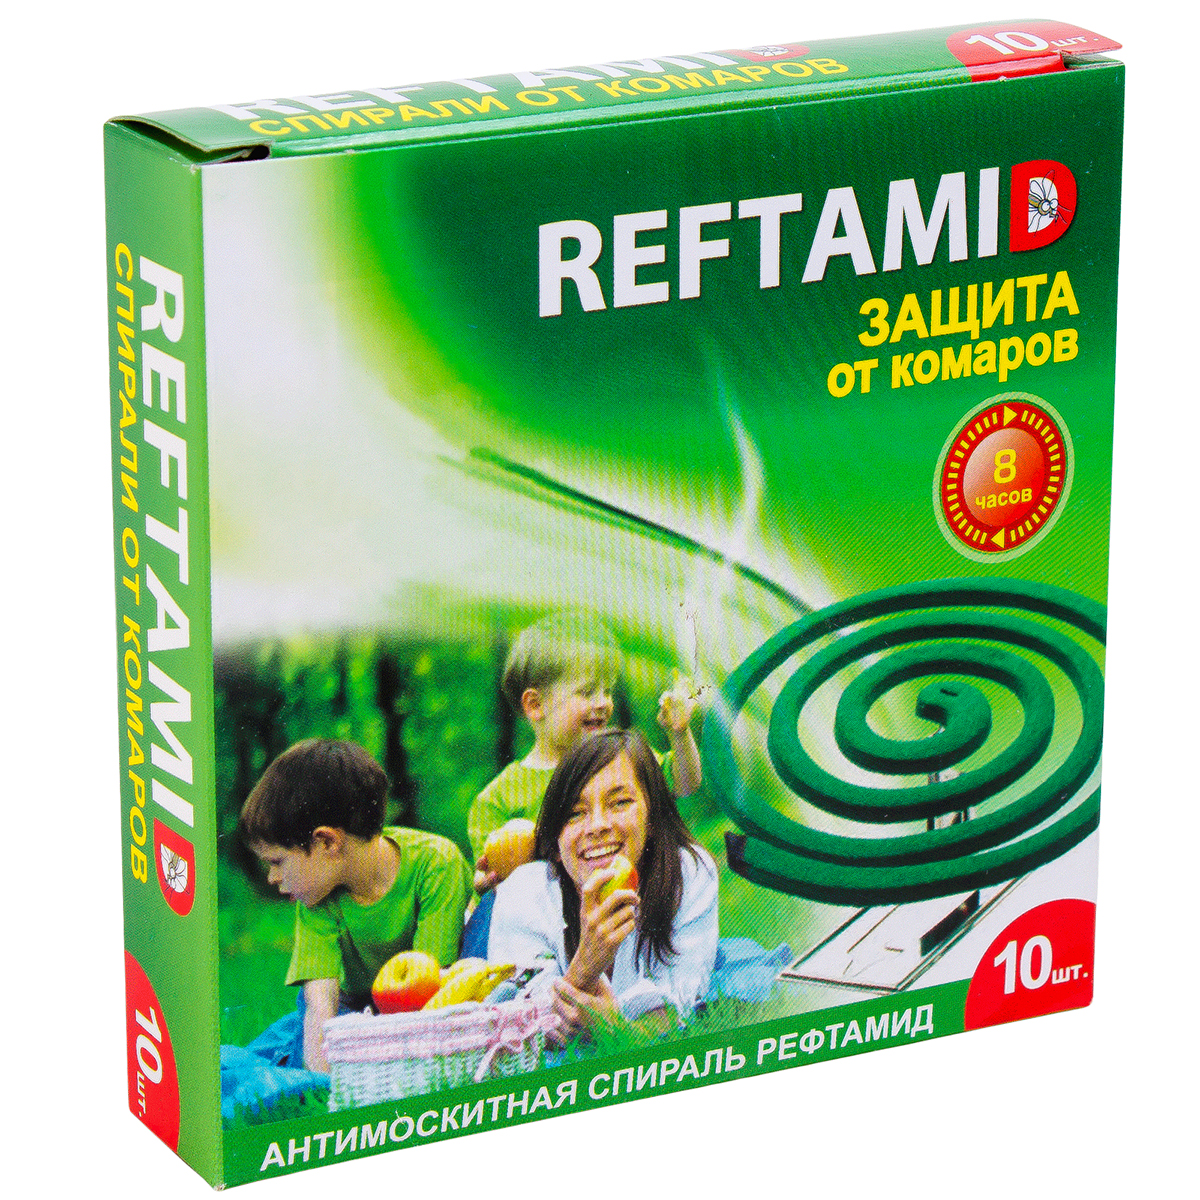 Спирали РЕФТАМИД Защита от комаров